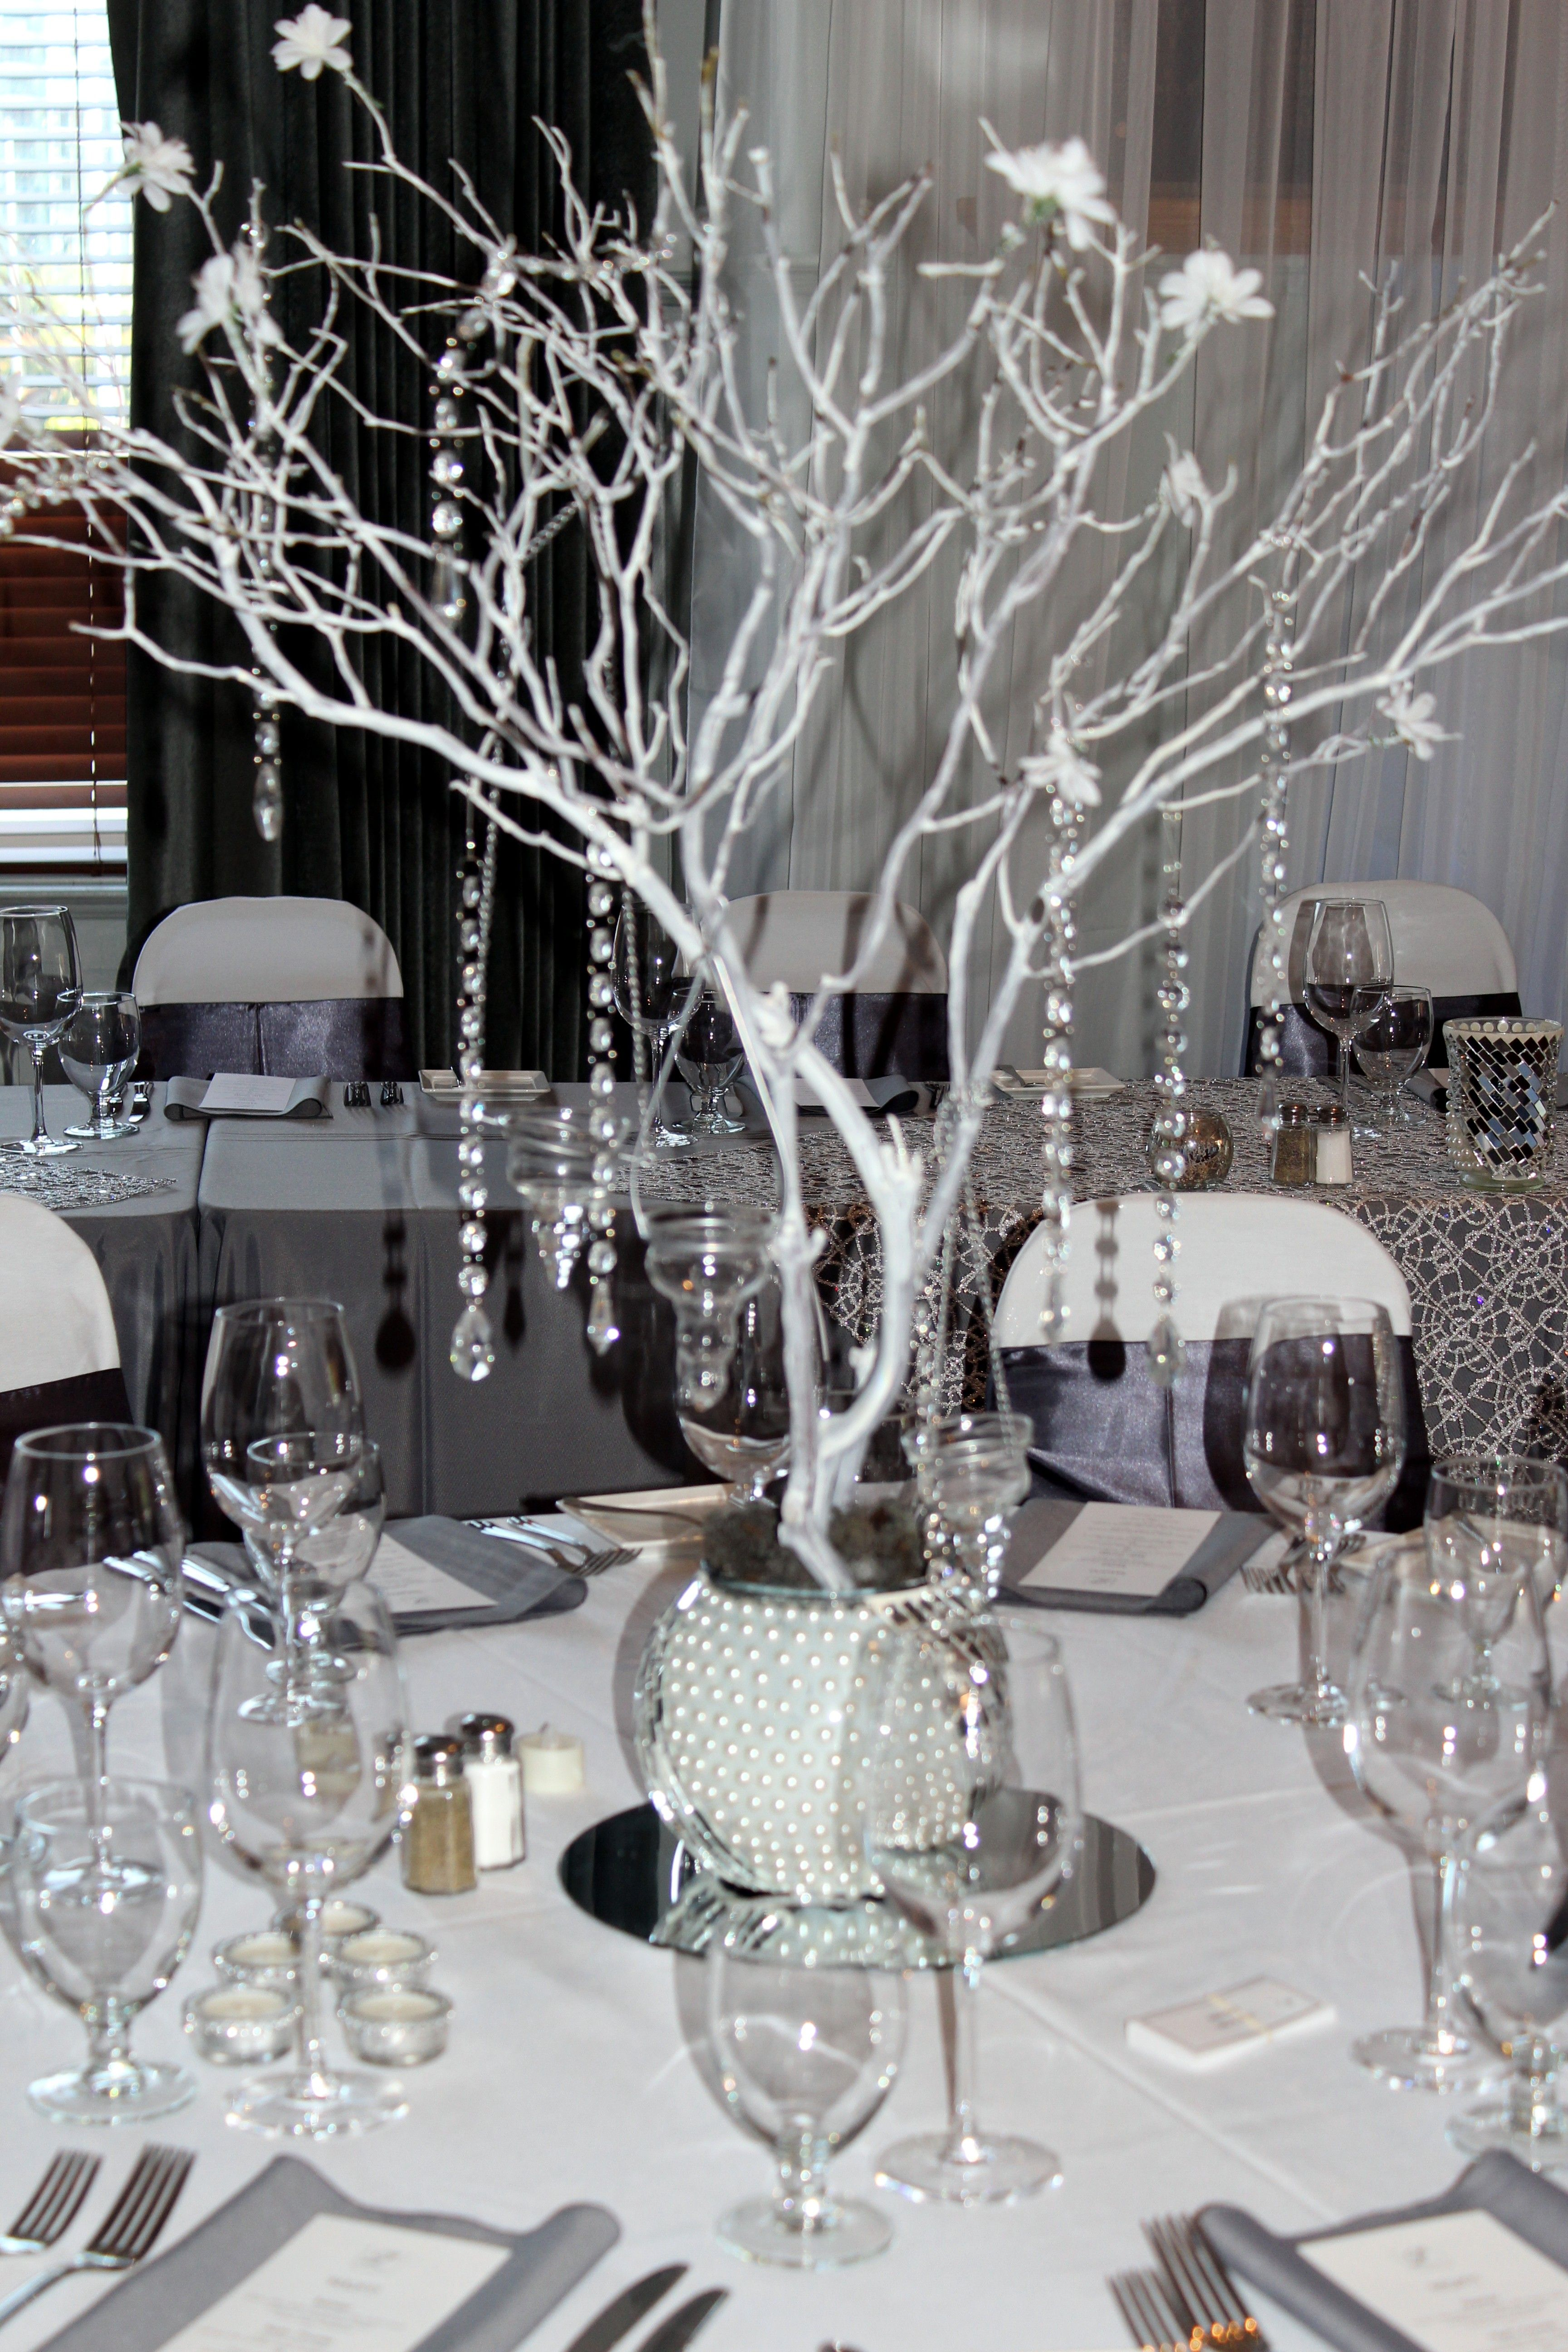 Manzanita centerpiece grey silver white bling wedding theme manzanita centerpiece grey silver white bling wedding theme contact me scootable on pinterest junglespirit Image collections